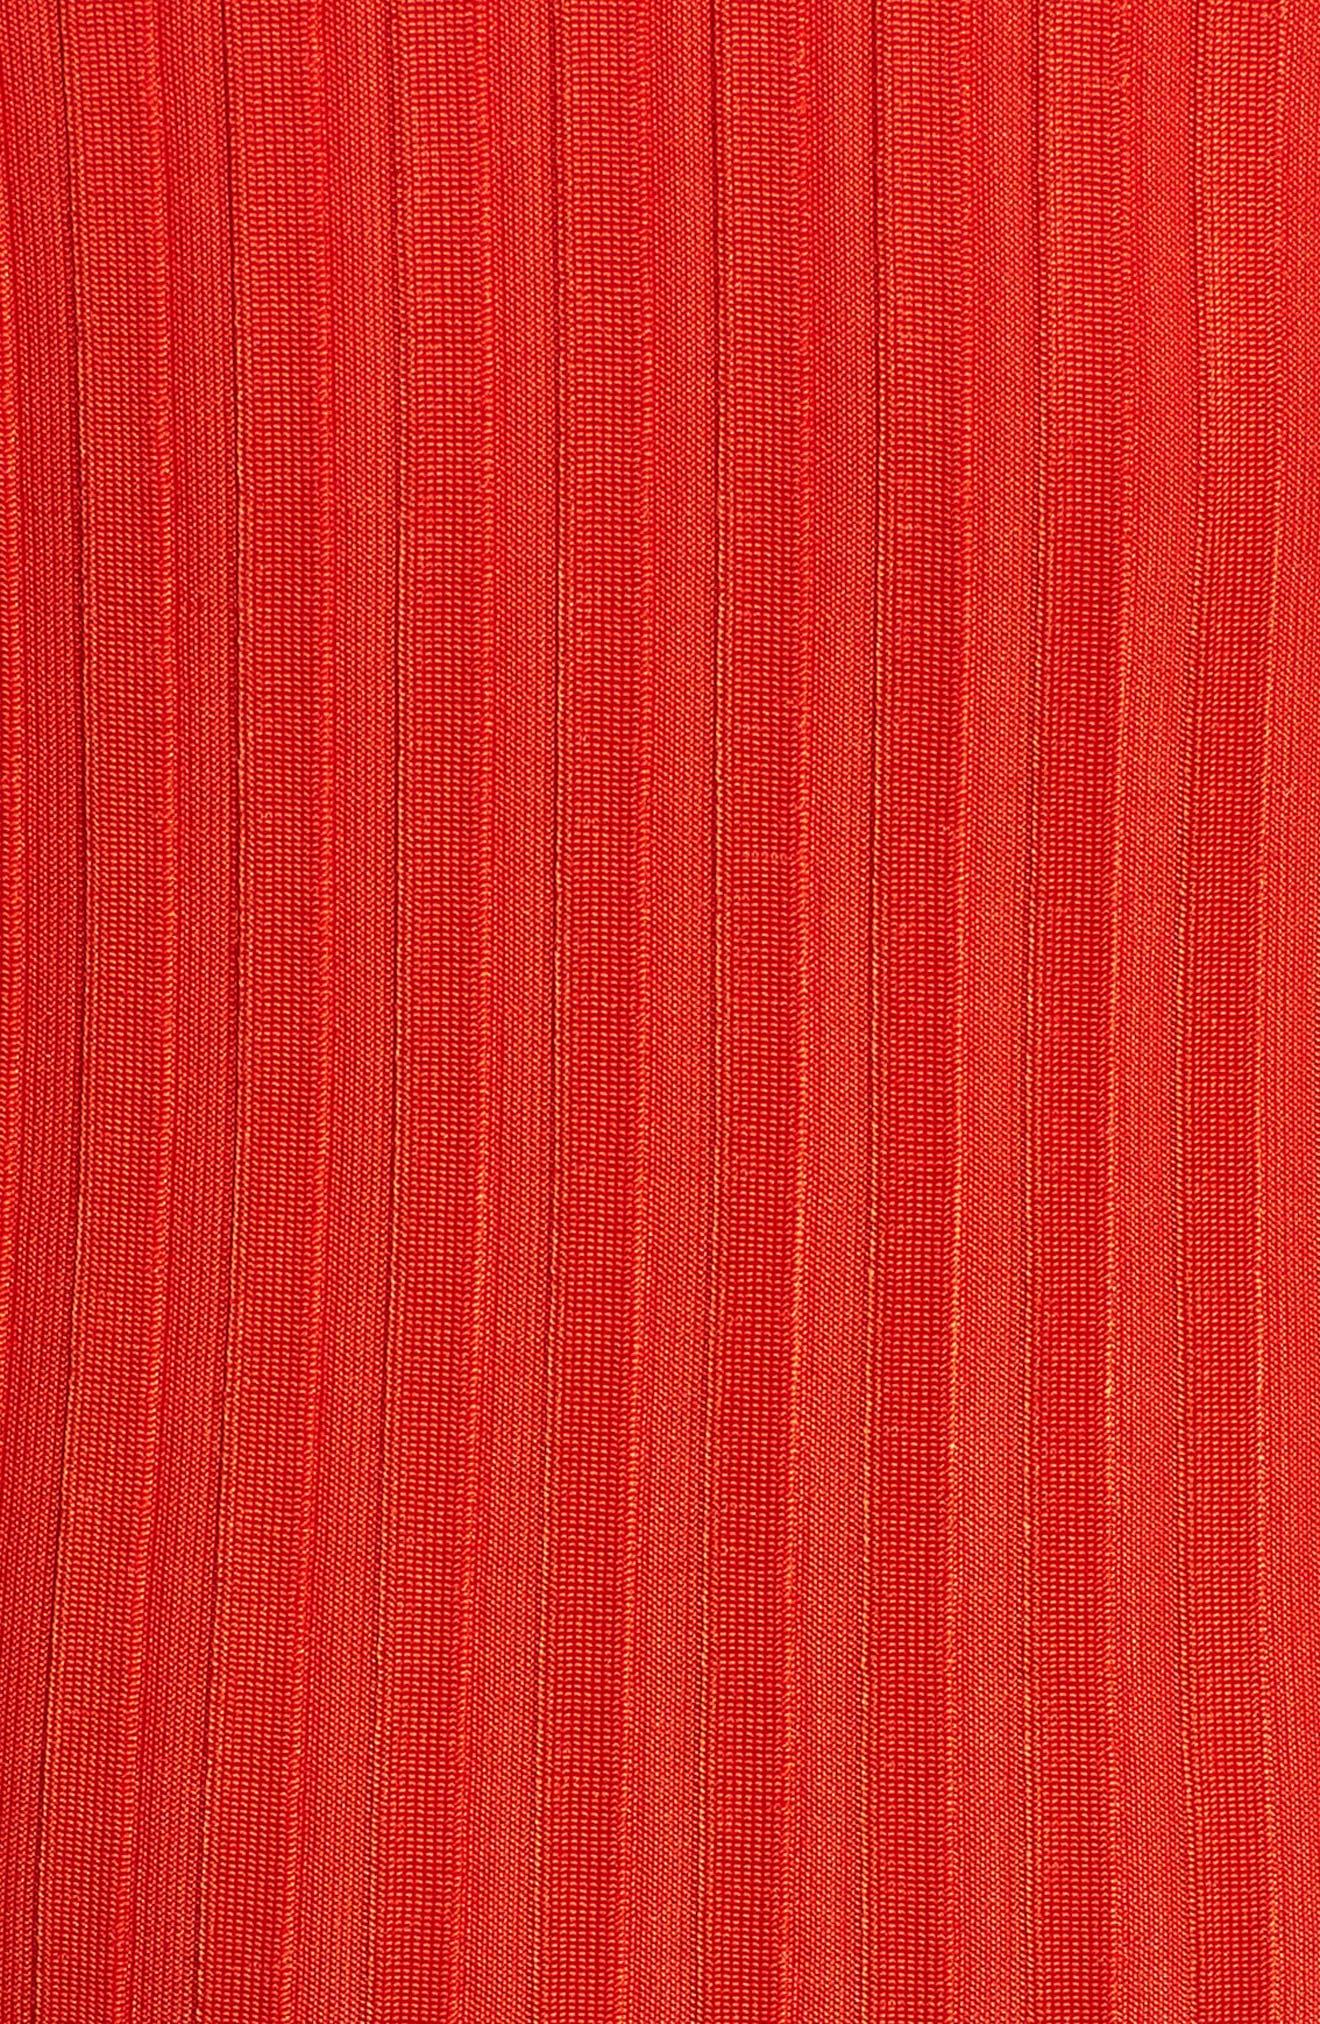 Etrica V-Neck Ribbed Top,                             Alternate thumbnail 6, color,                             Sunset Orange